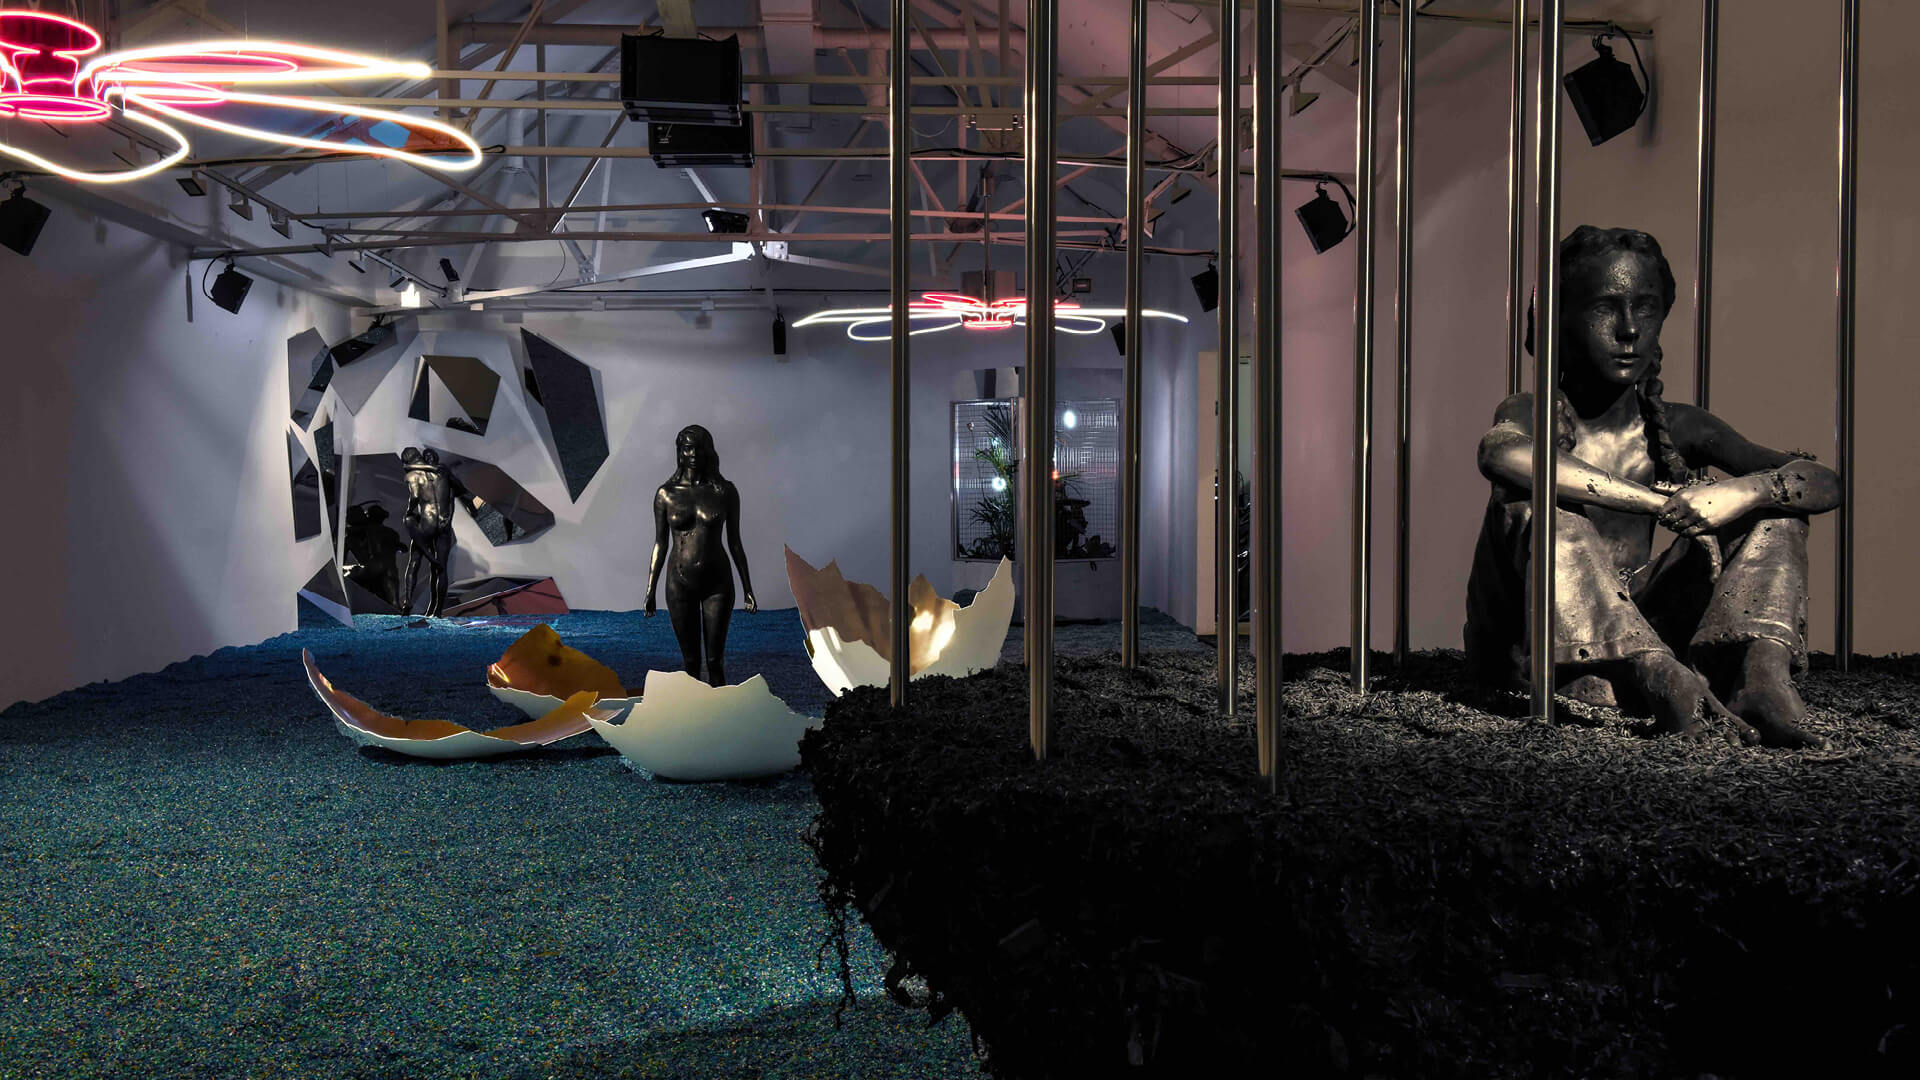 Installation view of Artificialis at Saatchi Gallery | Artificialis | Cyril de Commarque | STIRworld